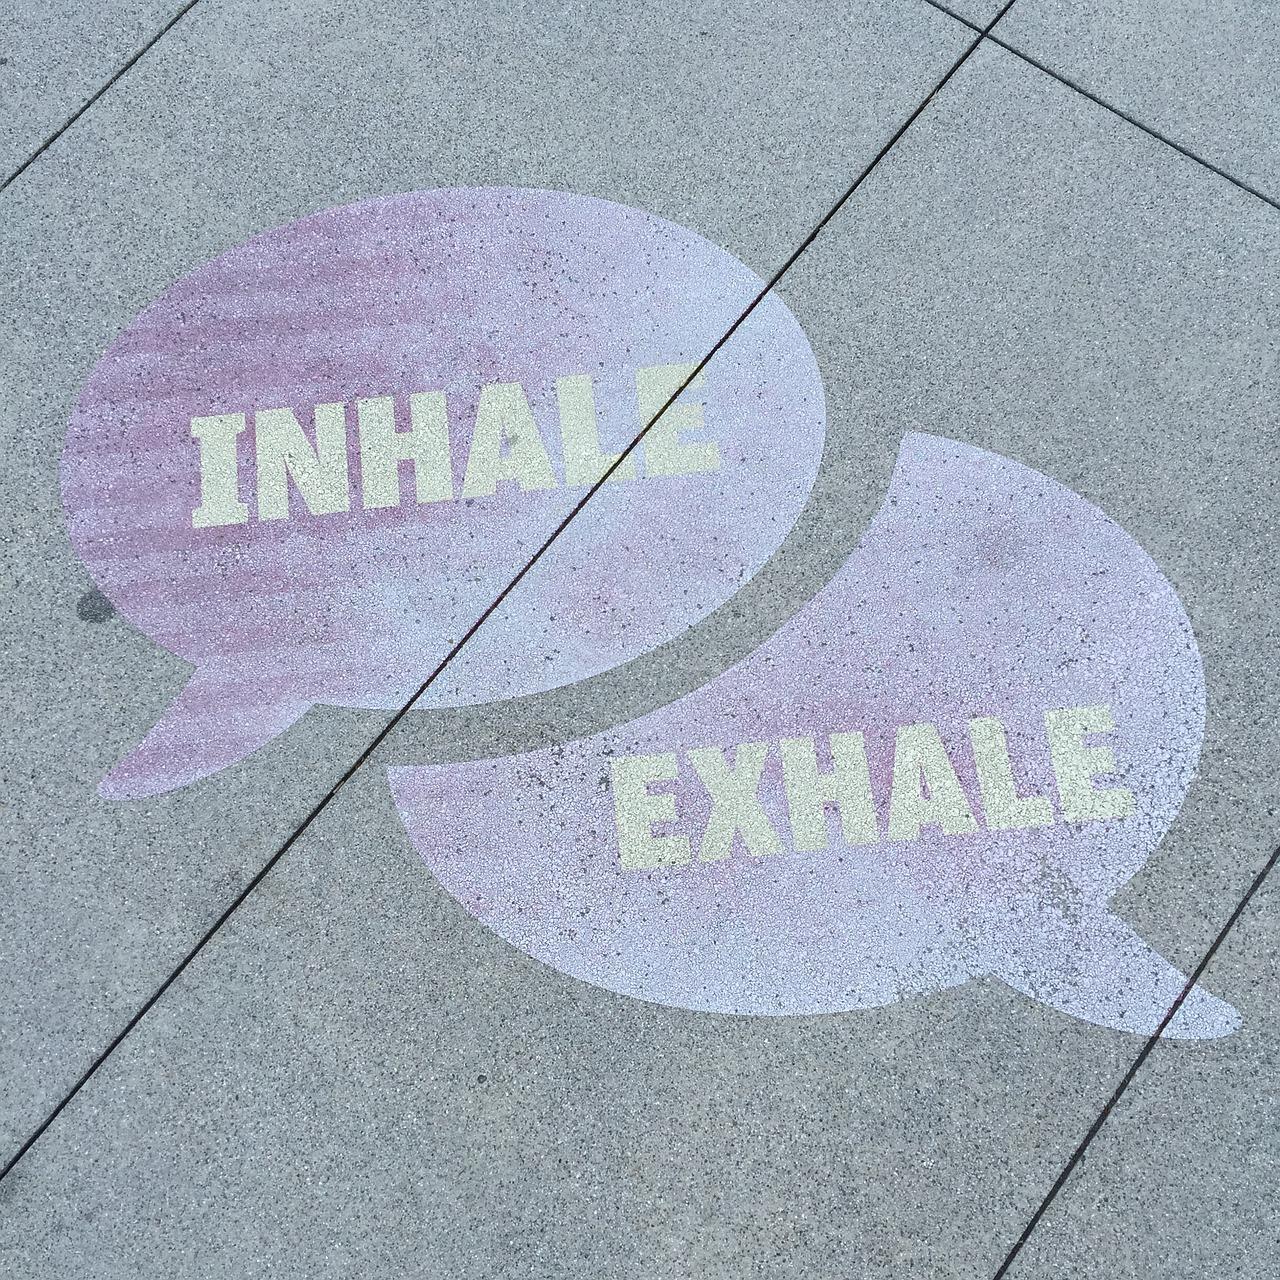 https://pixabay.com/photos/street-art-breathe-inhale-exhale-2720456/